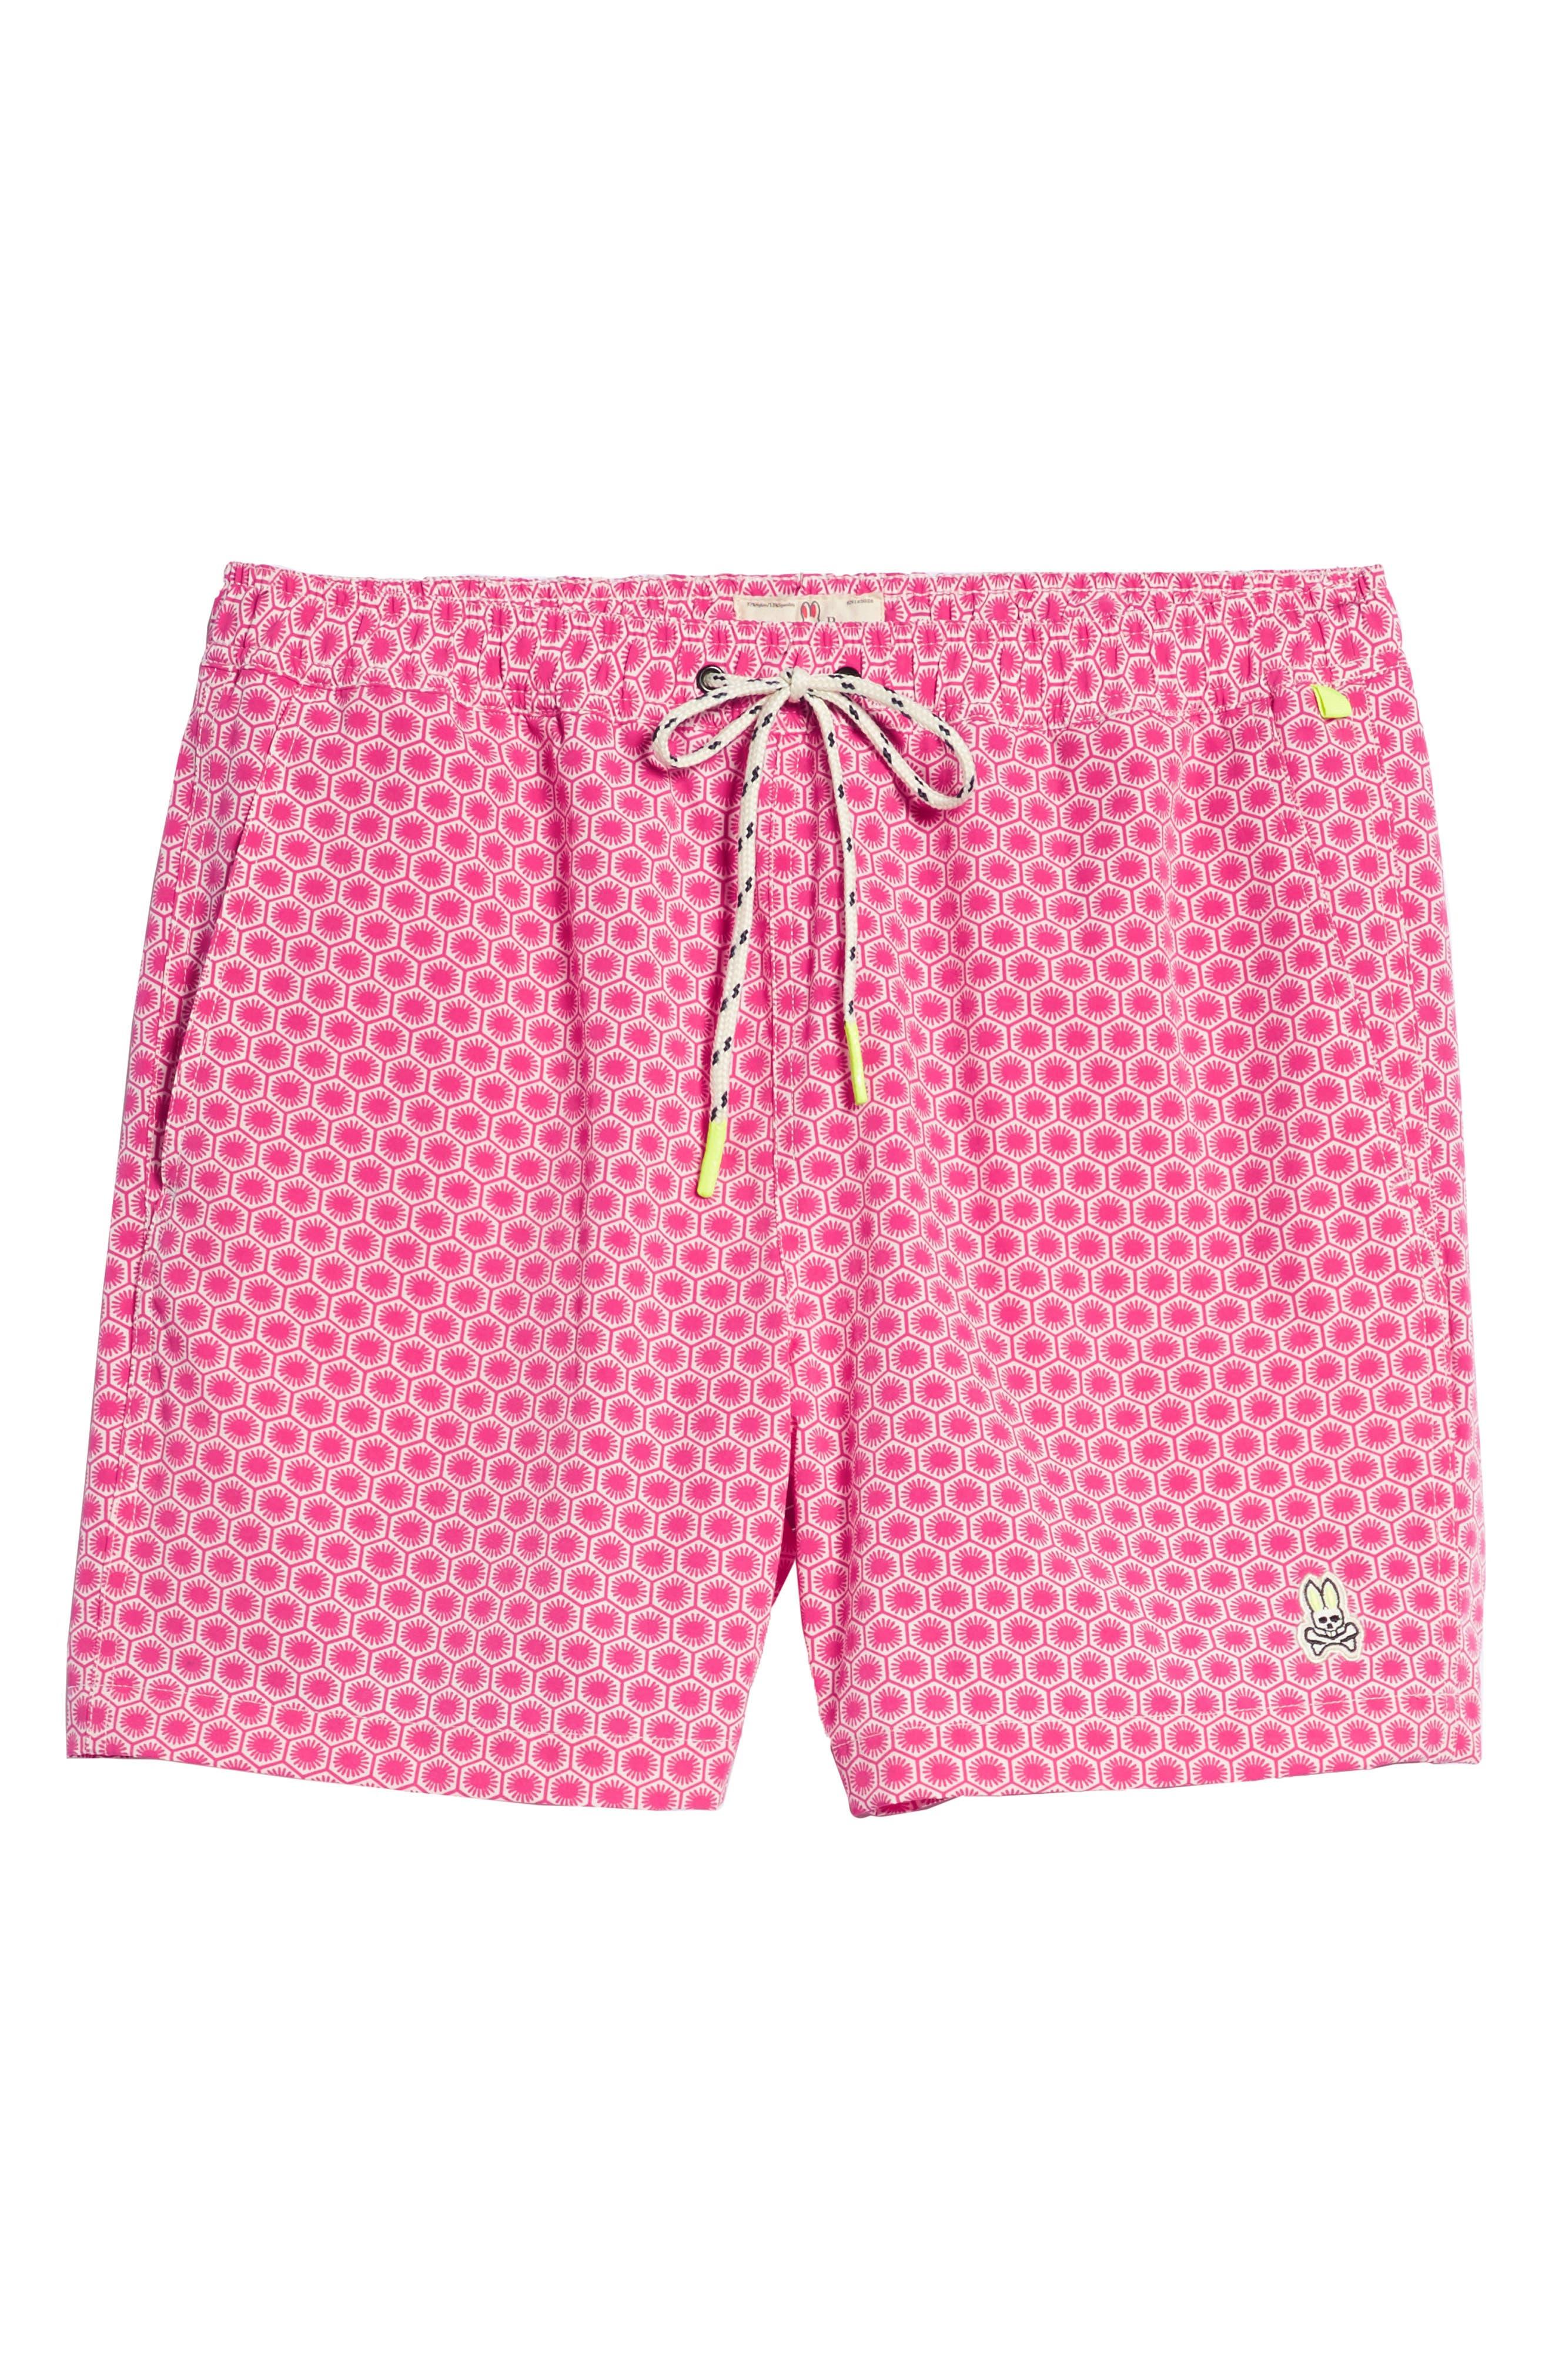 Psycho Bunny Japanese Honeycomb Swim Trunks,                             Alternate thumbnail 6, color,                             Raspberry